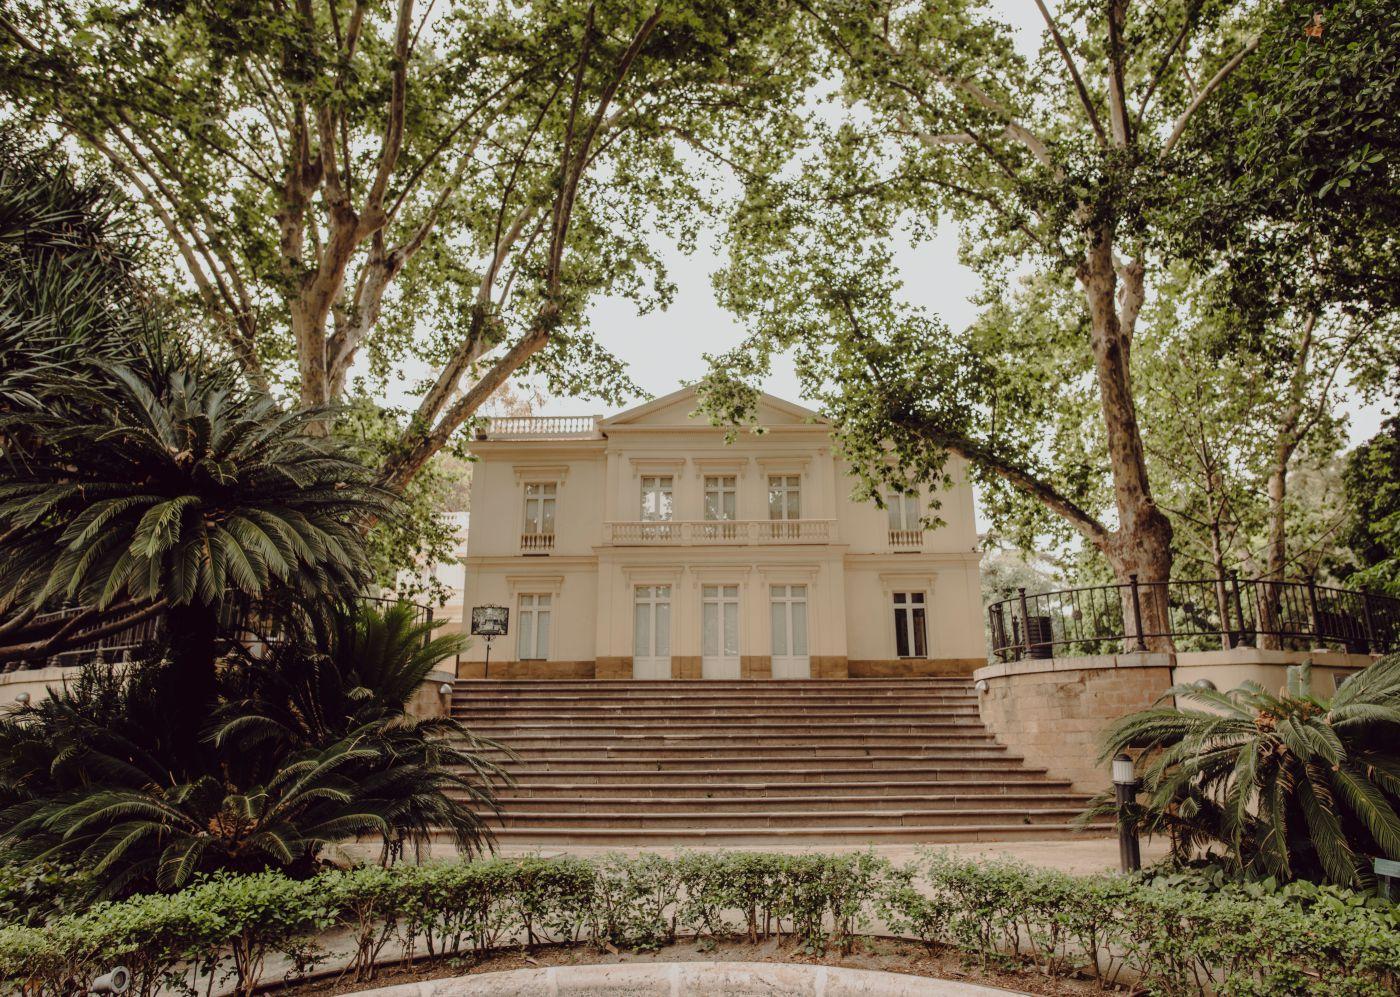 Jardín Botanico la Concepcion Malaga, The Garden